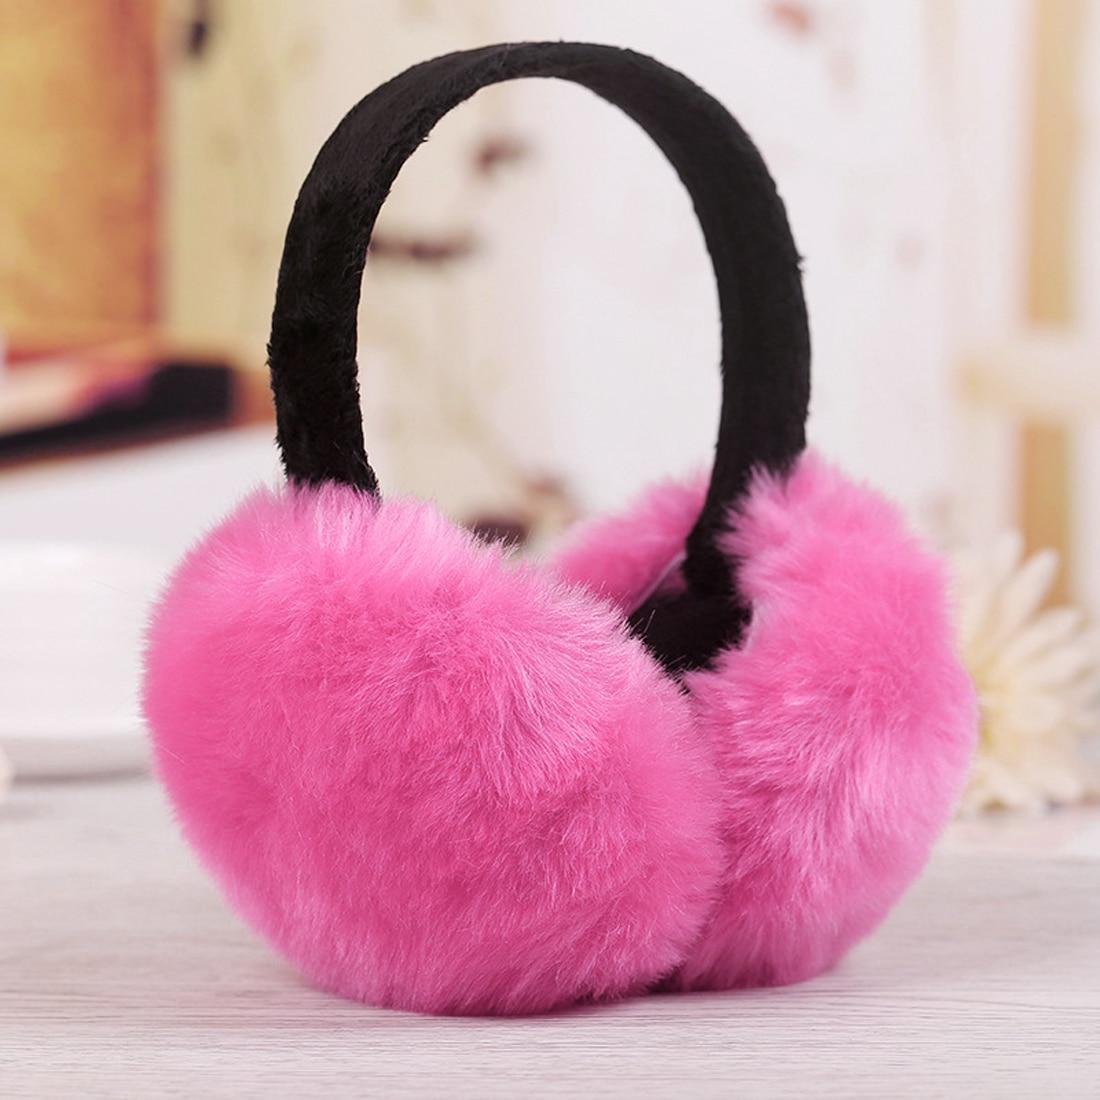 New Winter Women Men Earmuffs Lovers Ear Warmer Imitation Rabbit Plush Plain Teenage Earmuffs Student Girl Ear Muffs